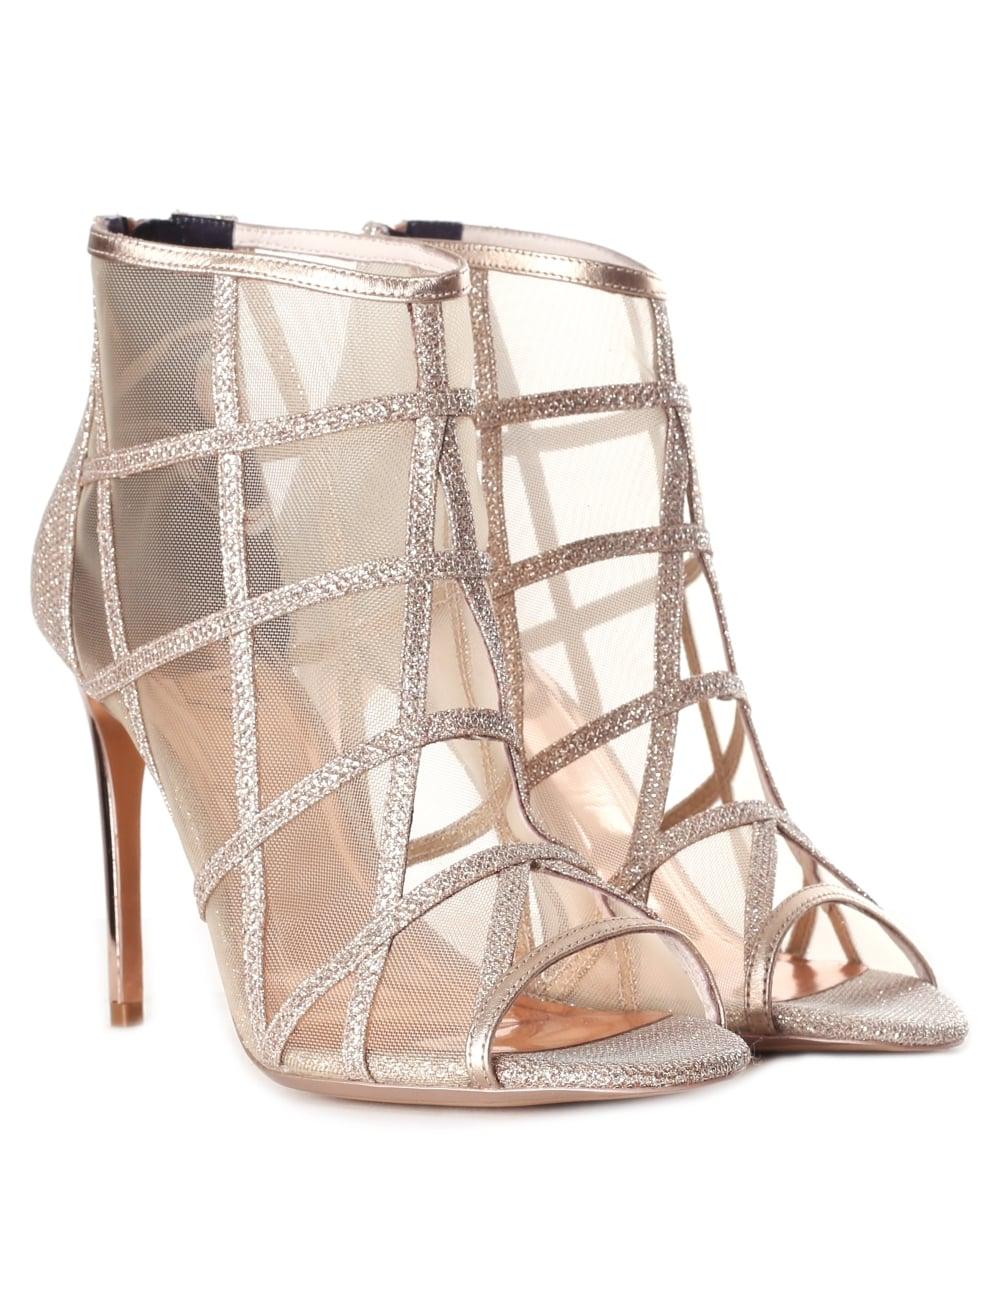 4460d98e003c Ted Baker Women s Xstal Mesh Peep Toe Boots